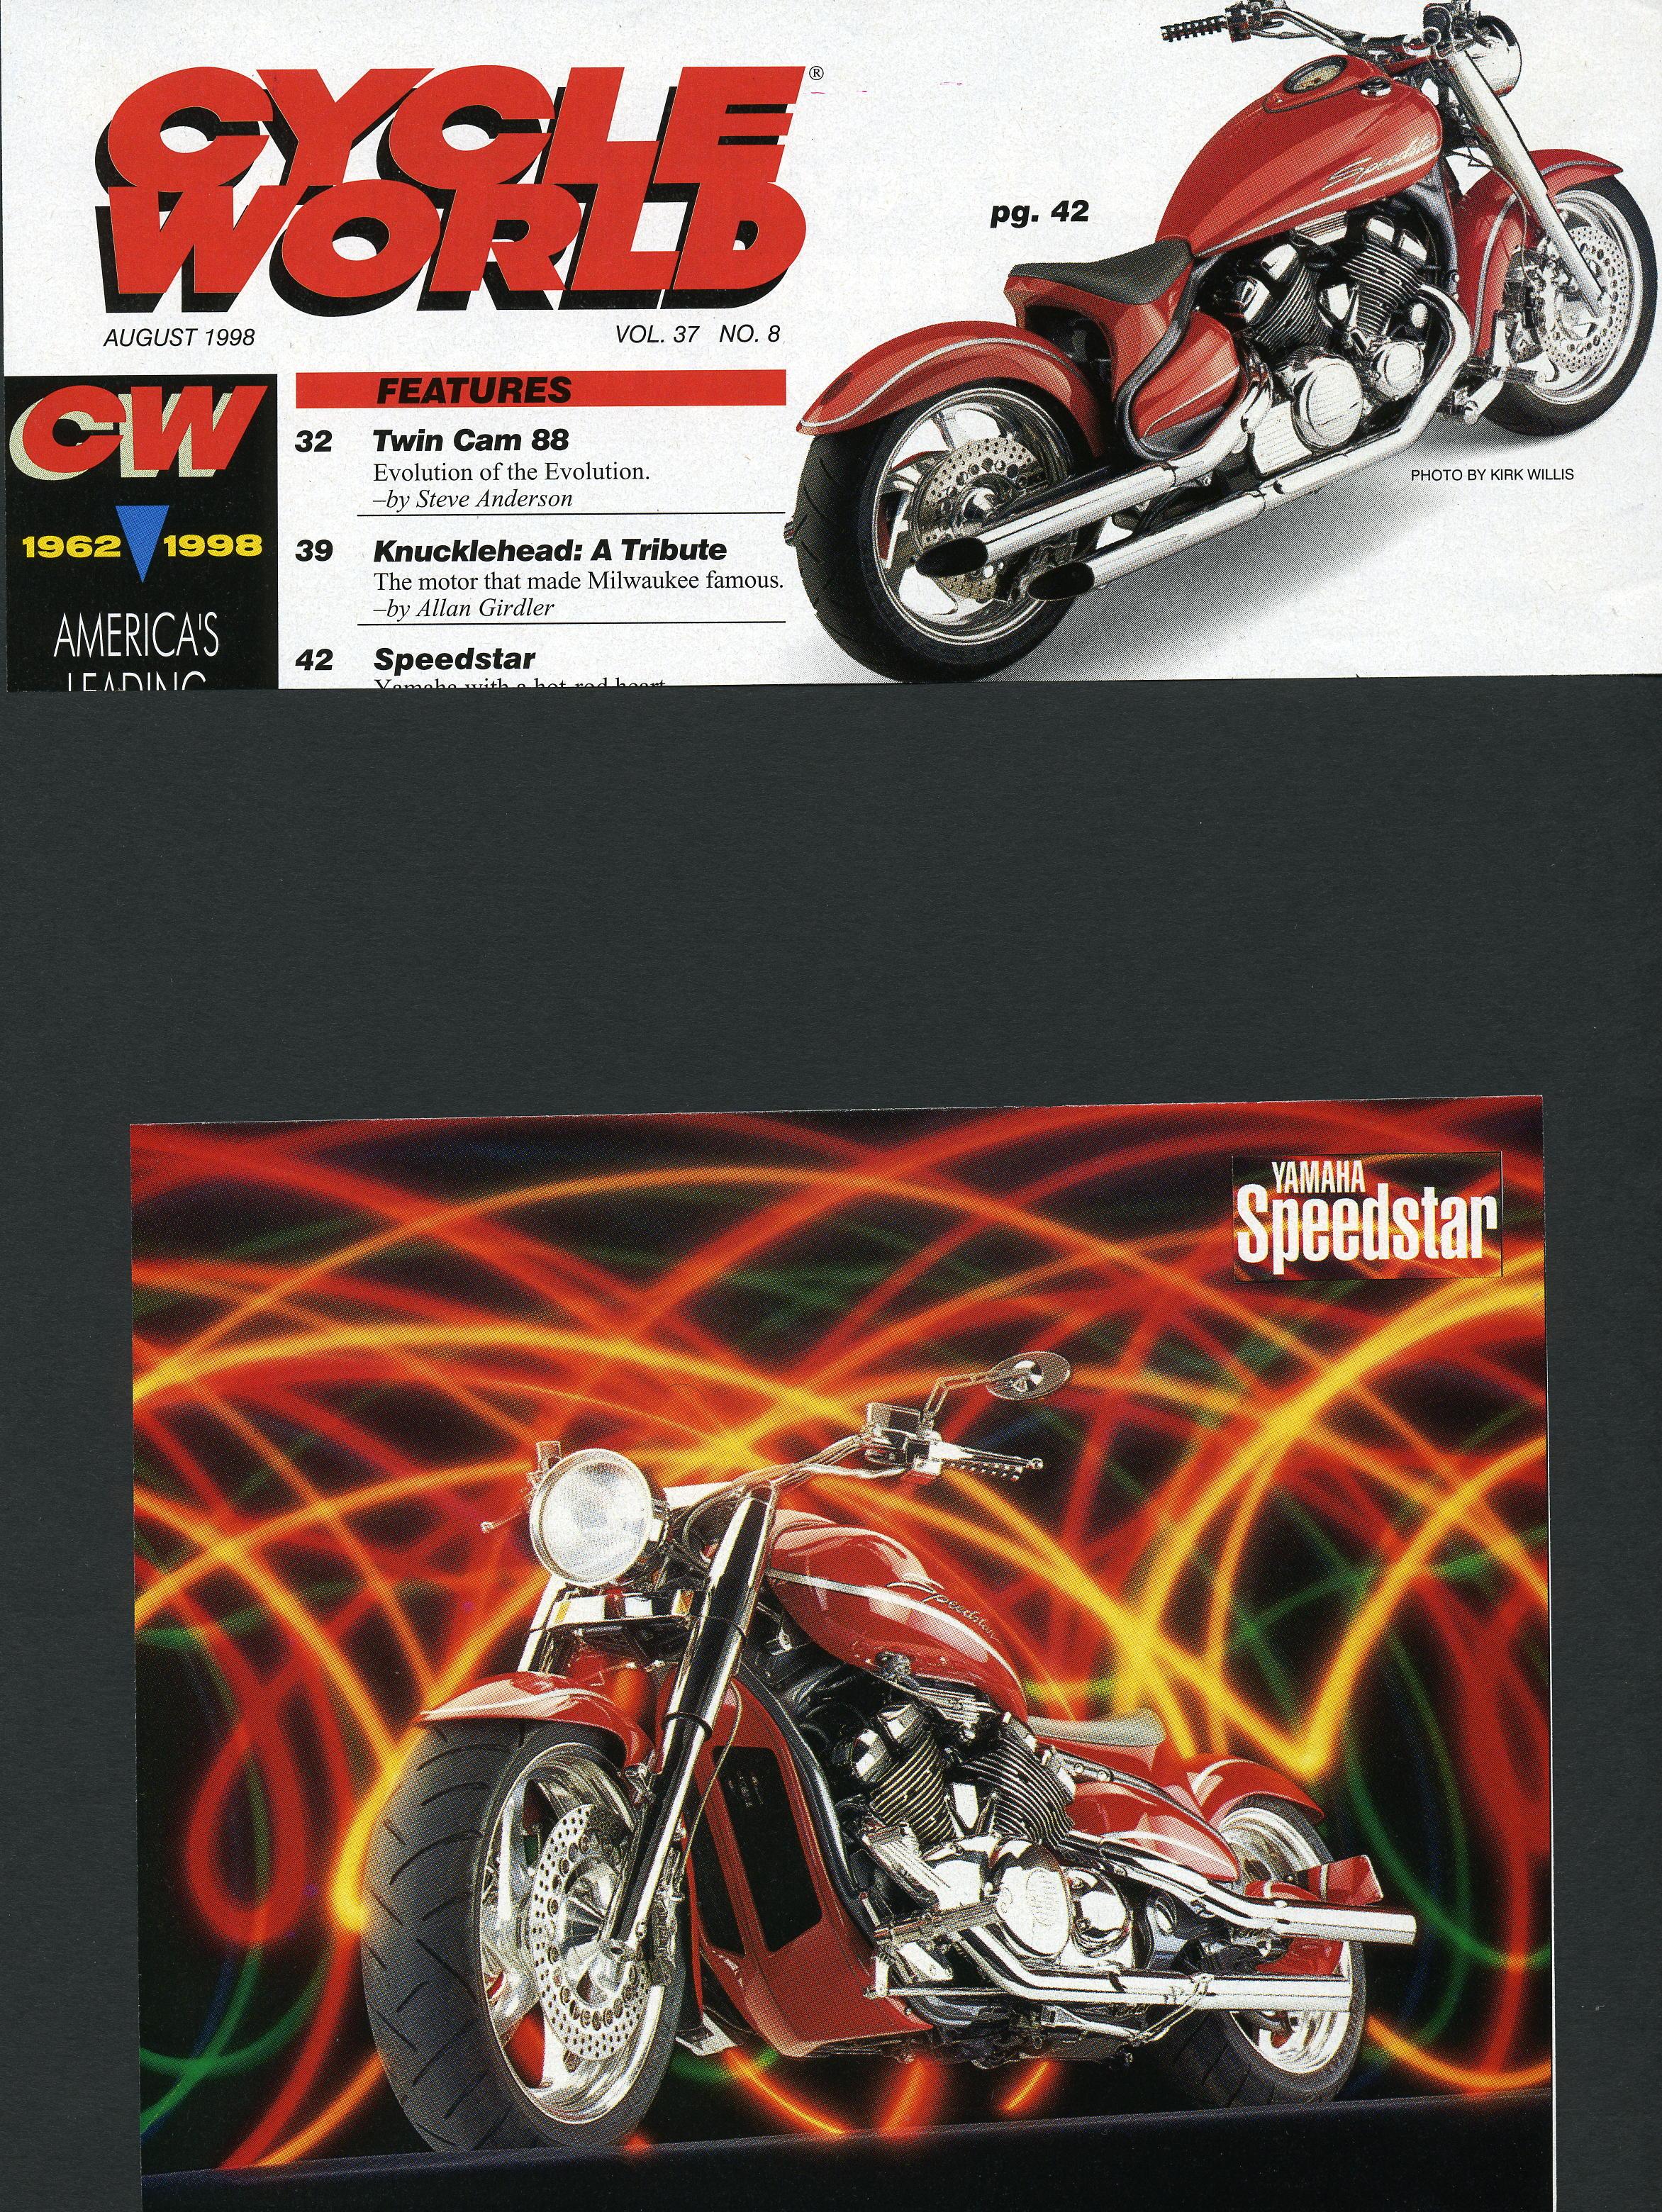 Jeff Palhegyi Design0105.jpg